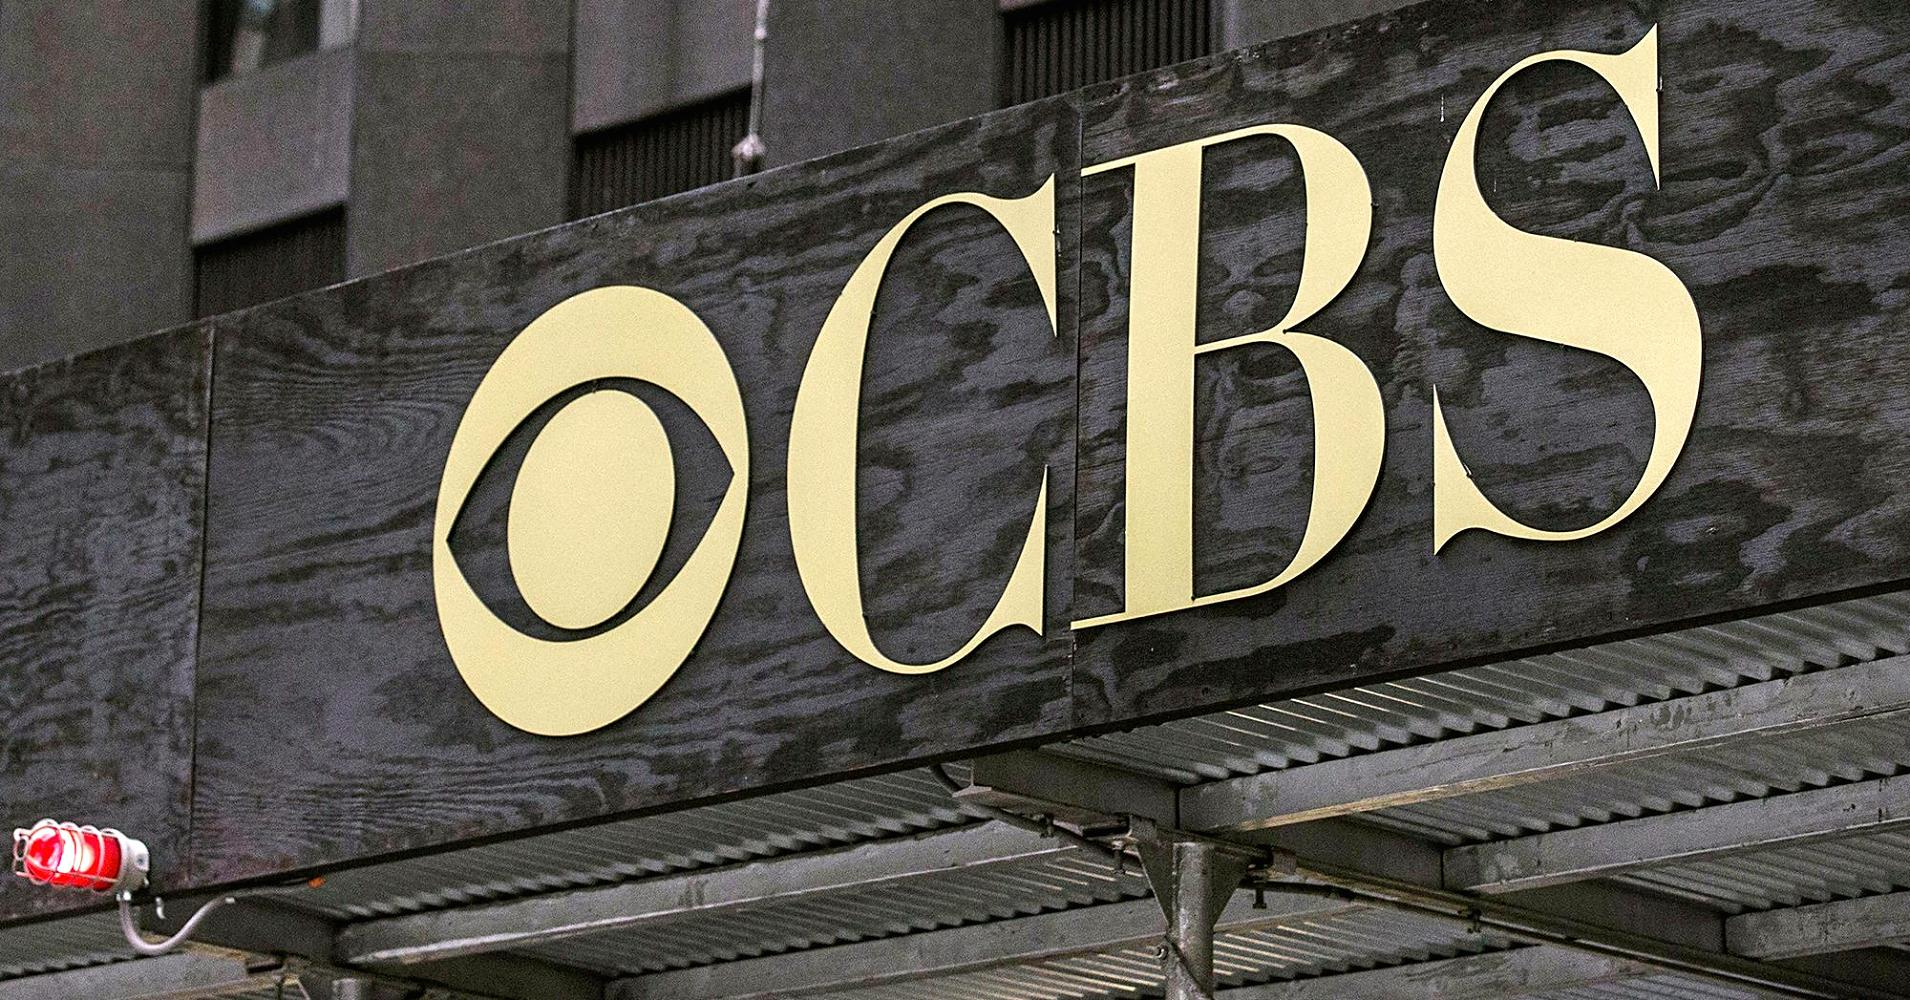 CBS Television Network | Entertainment News | TV News 2017